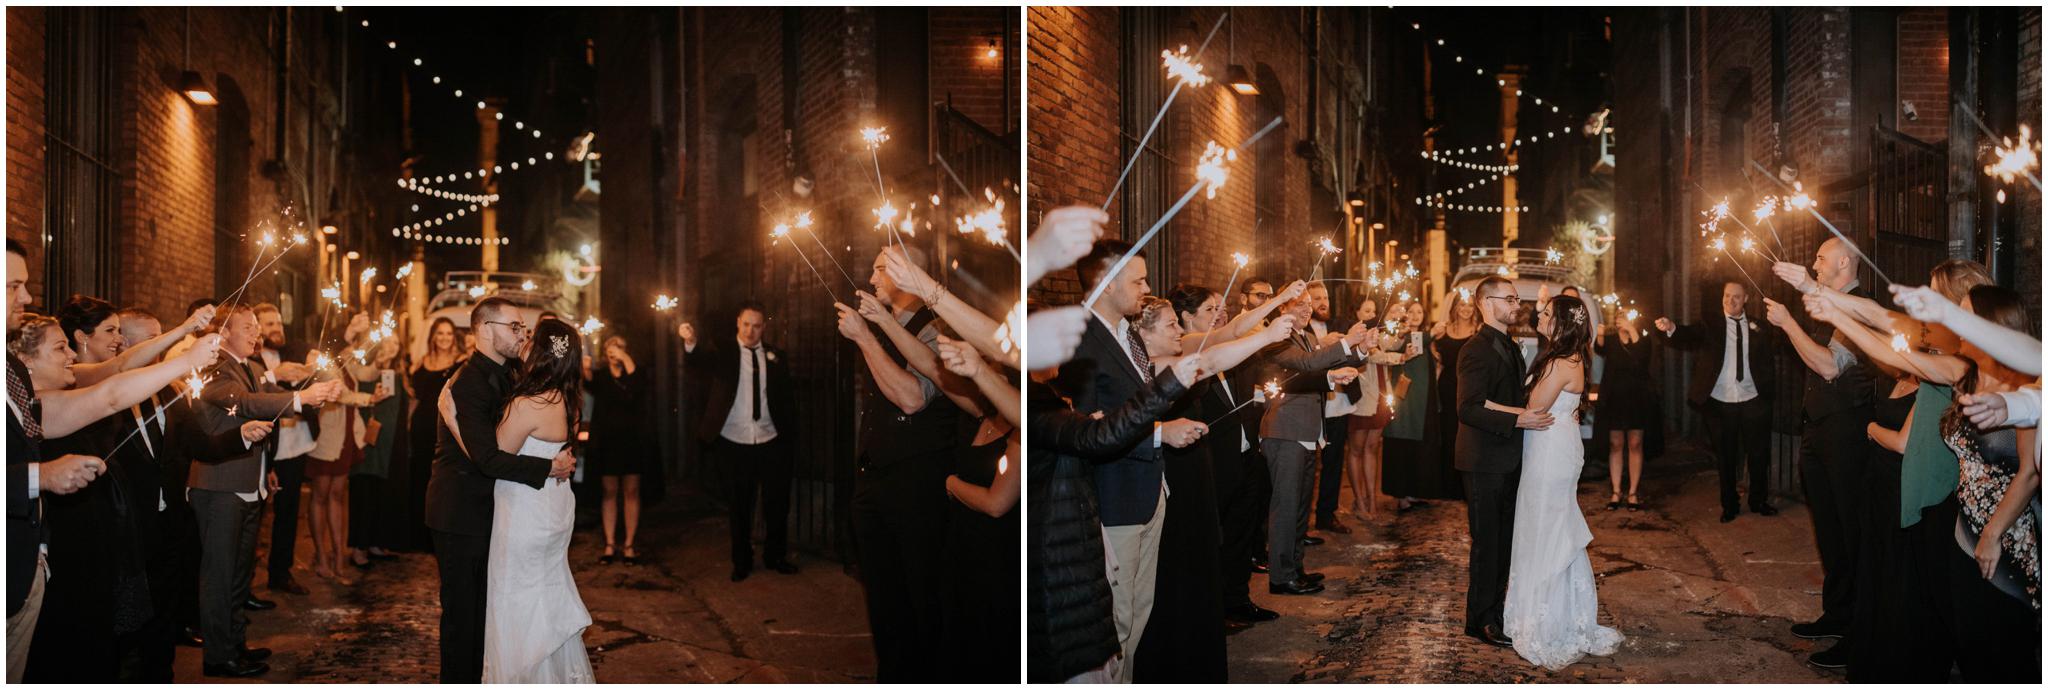 danny+mackenzie+downtown-seattle-axis-wedding-seattle-photographer-133.jpg